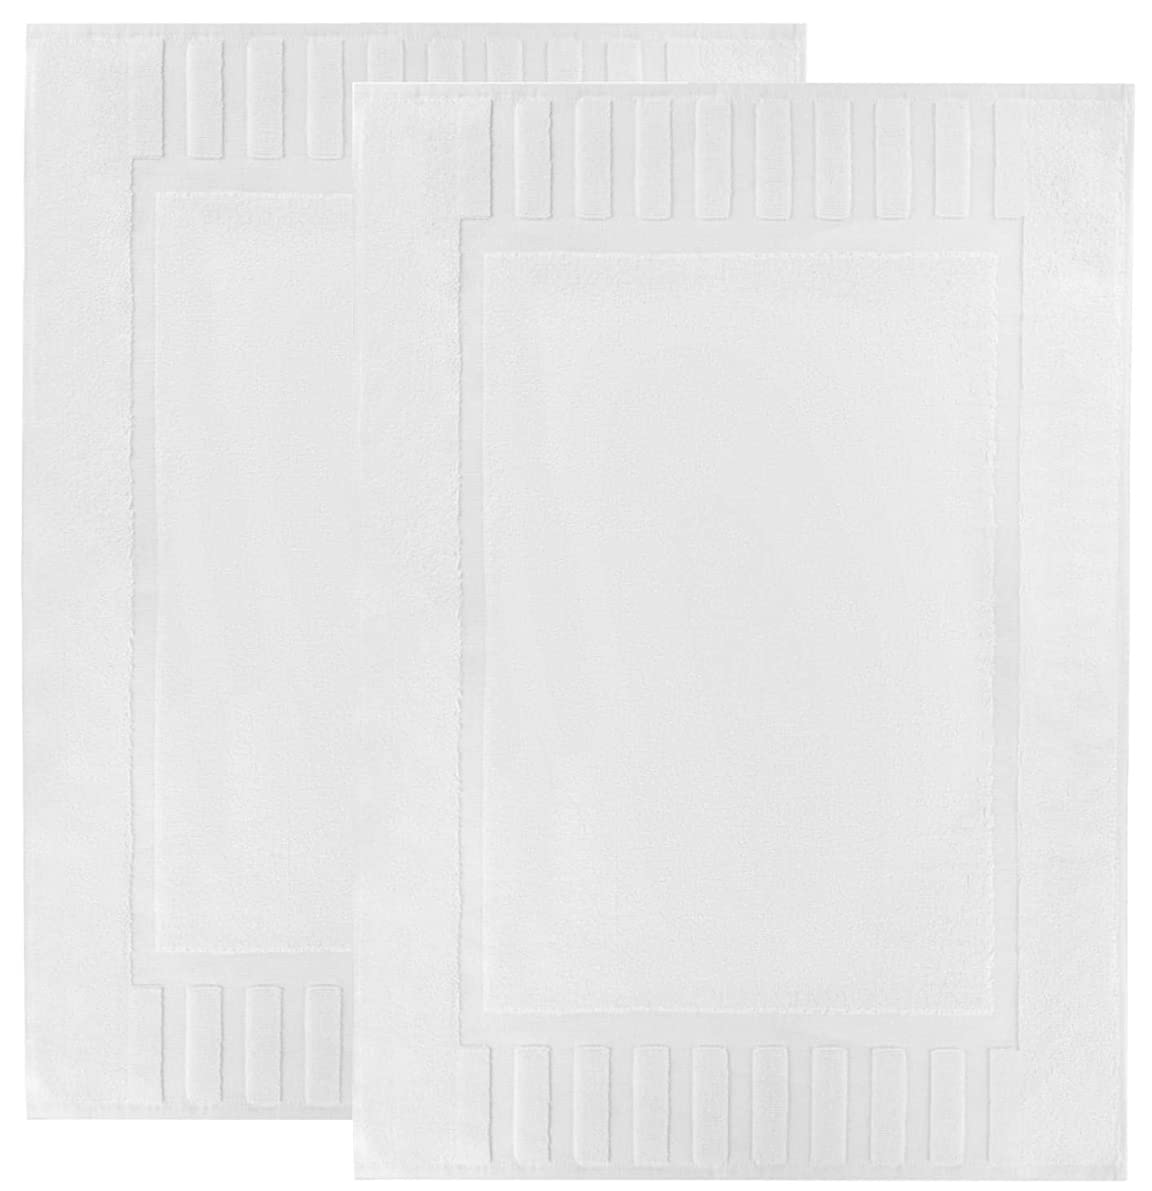 Luxury Bath Mat Floor Towel Set - Absorbent Cotton Hotel Spa Shower/Bathtub Mats [Not a Bathroom Rug] 22